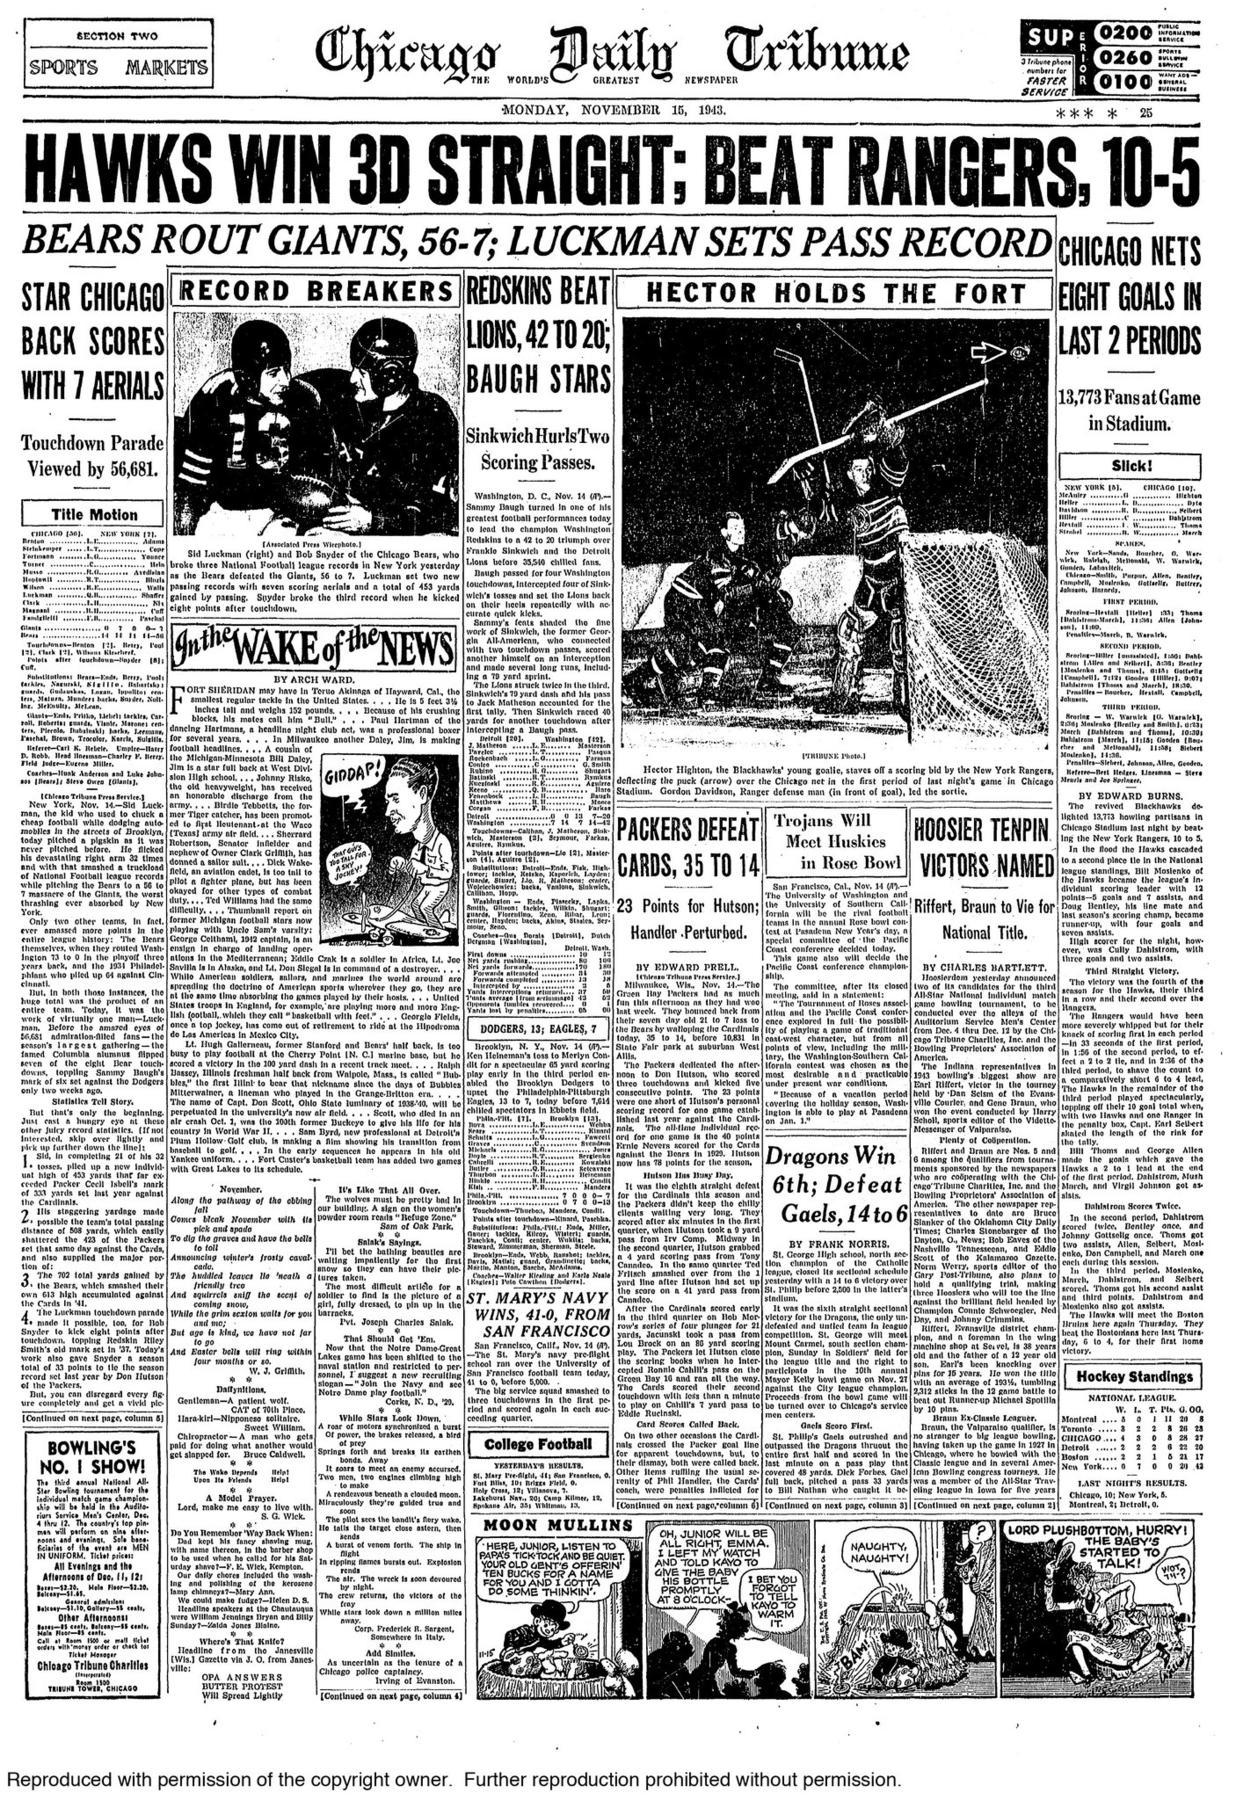 Nov. 14, 1943: Sid Luckman puts on an air show